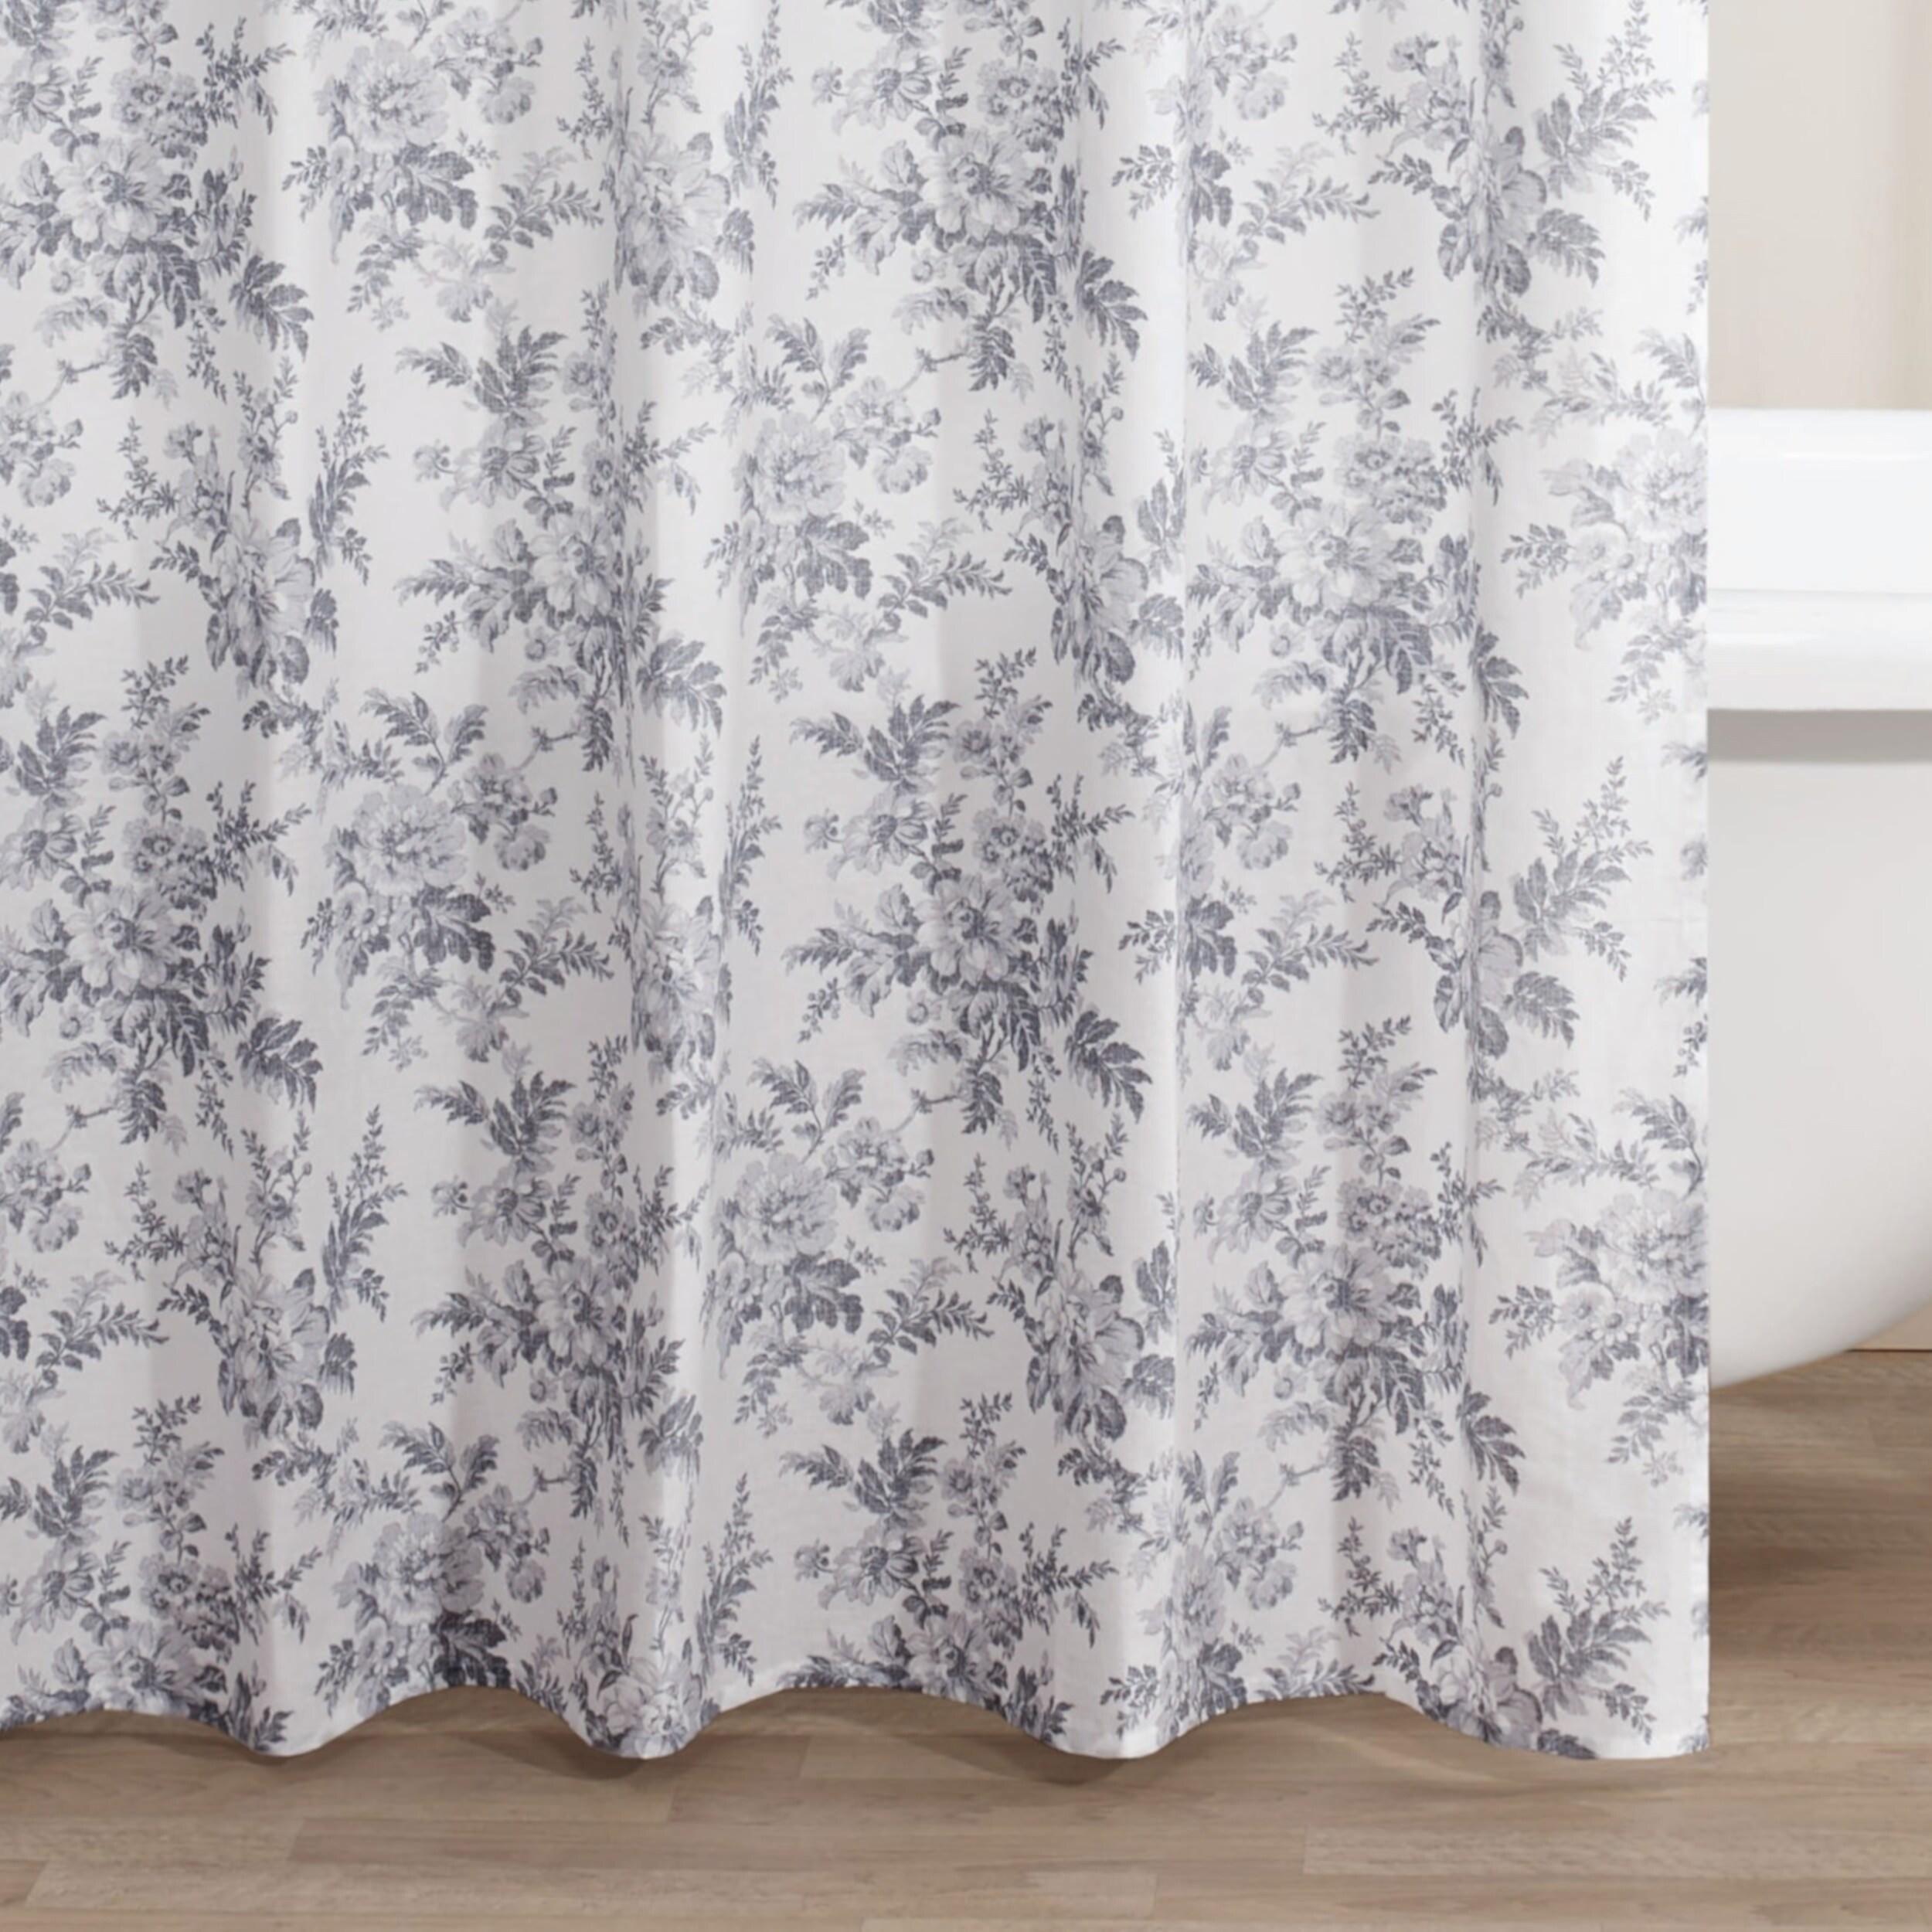 Shop Laura Ashley Annalise Shower Curtain